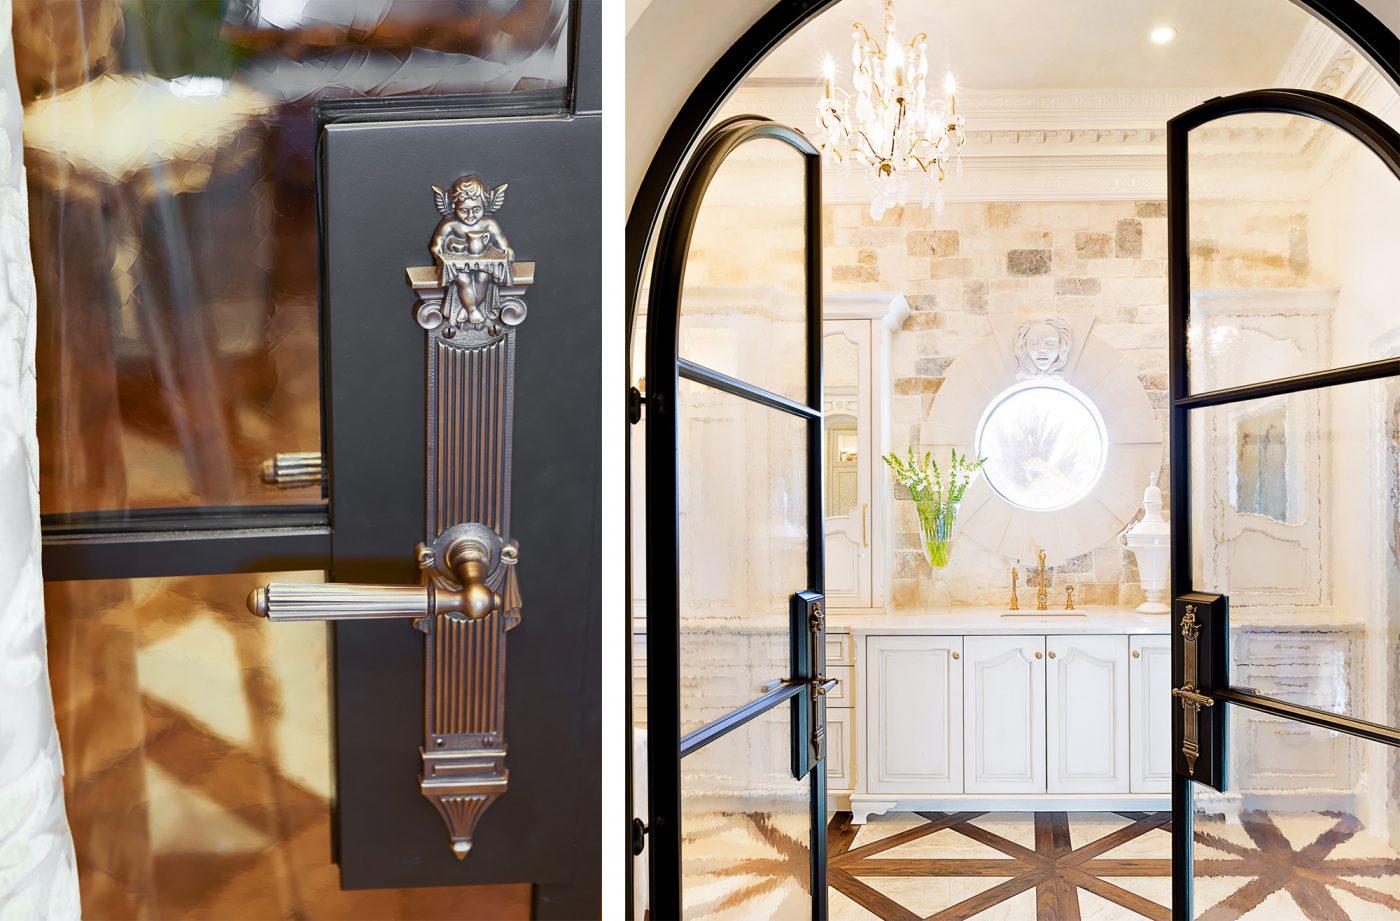 Renaissance revival spa boutique tara dudley interiors for Tara louise interior decoration design